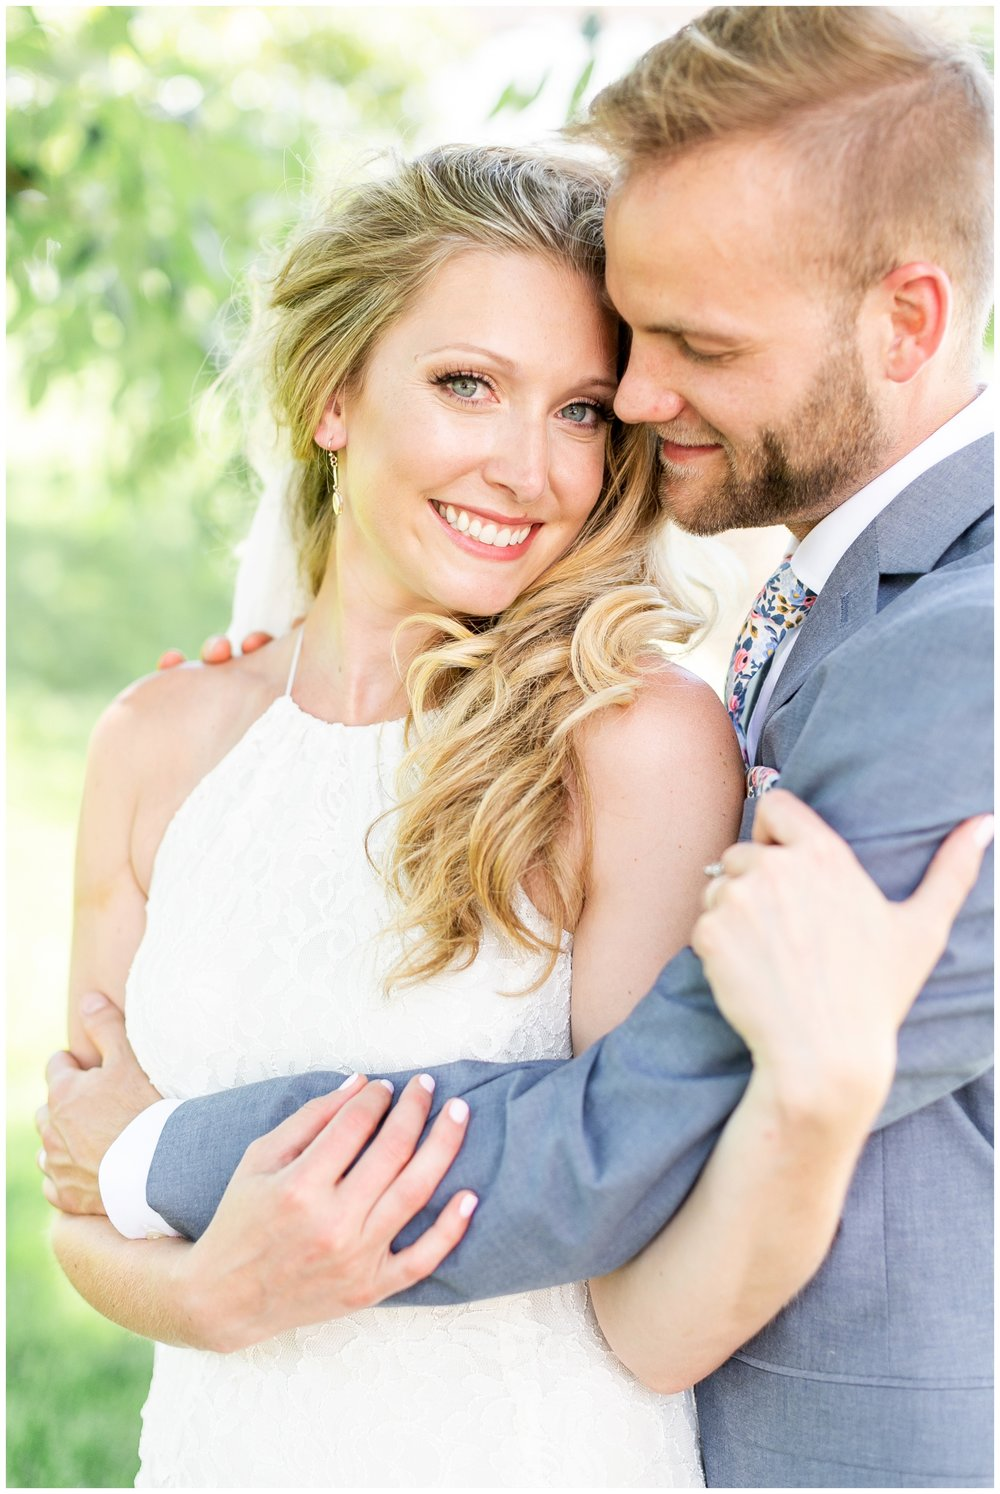 the_cupola_barn_wedding_delafield_resort_oconomowoc_wisconsin_0359.jpg